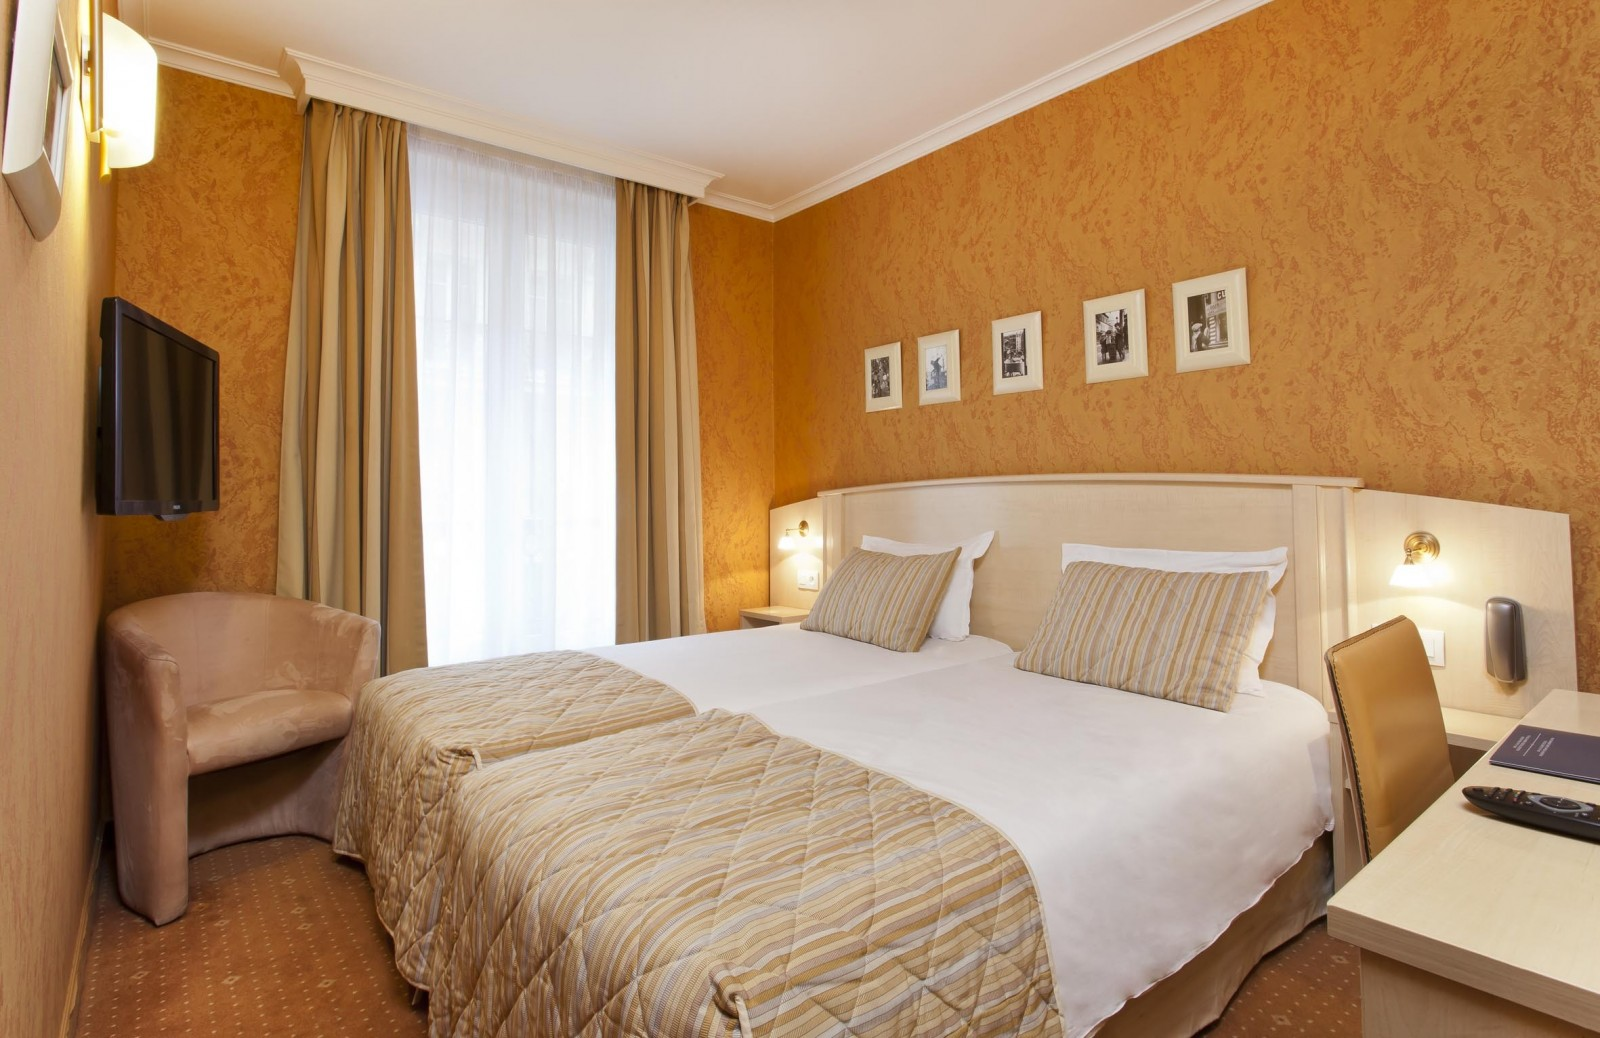 Paris Hotel Room: Deluxe Twin room - Hotel Elysées Opera